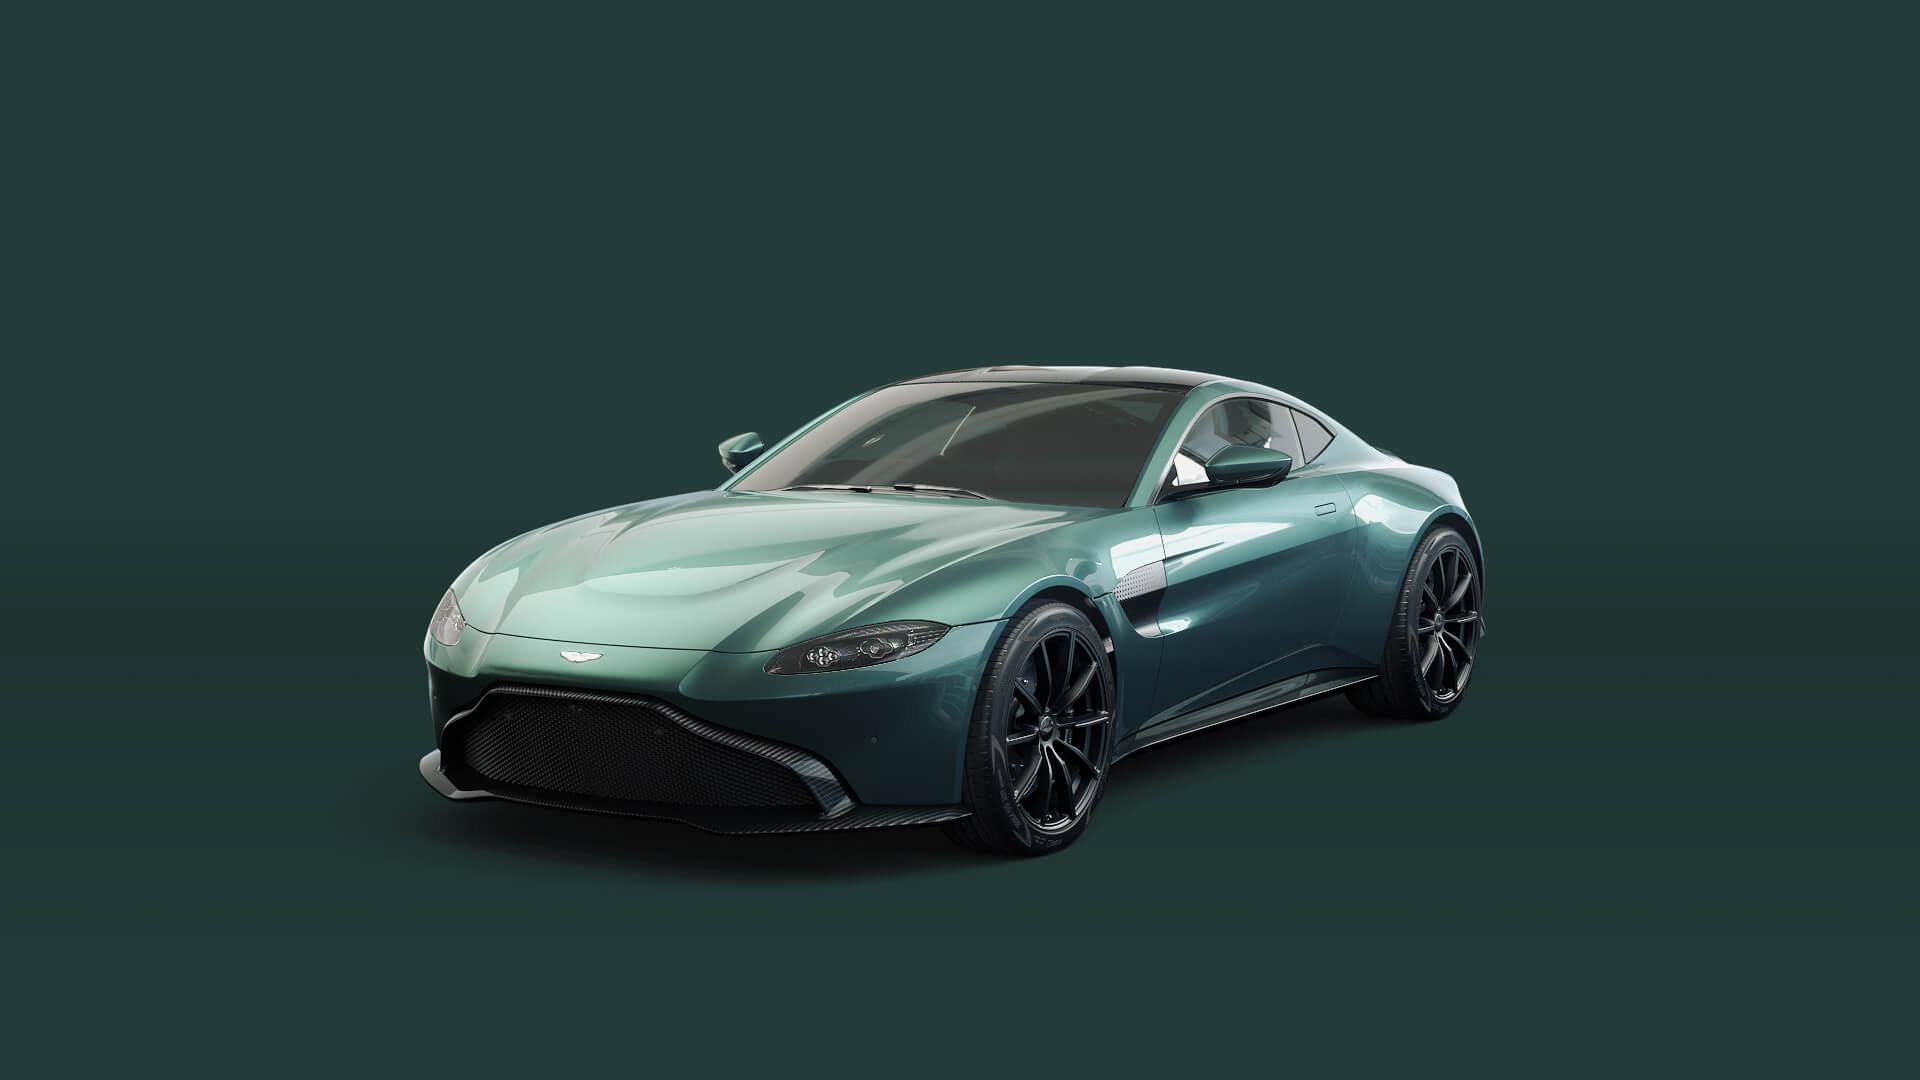 Aston Martin | Iconic Luxury British Sports Cars (USA)